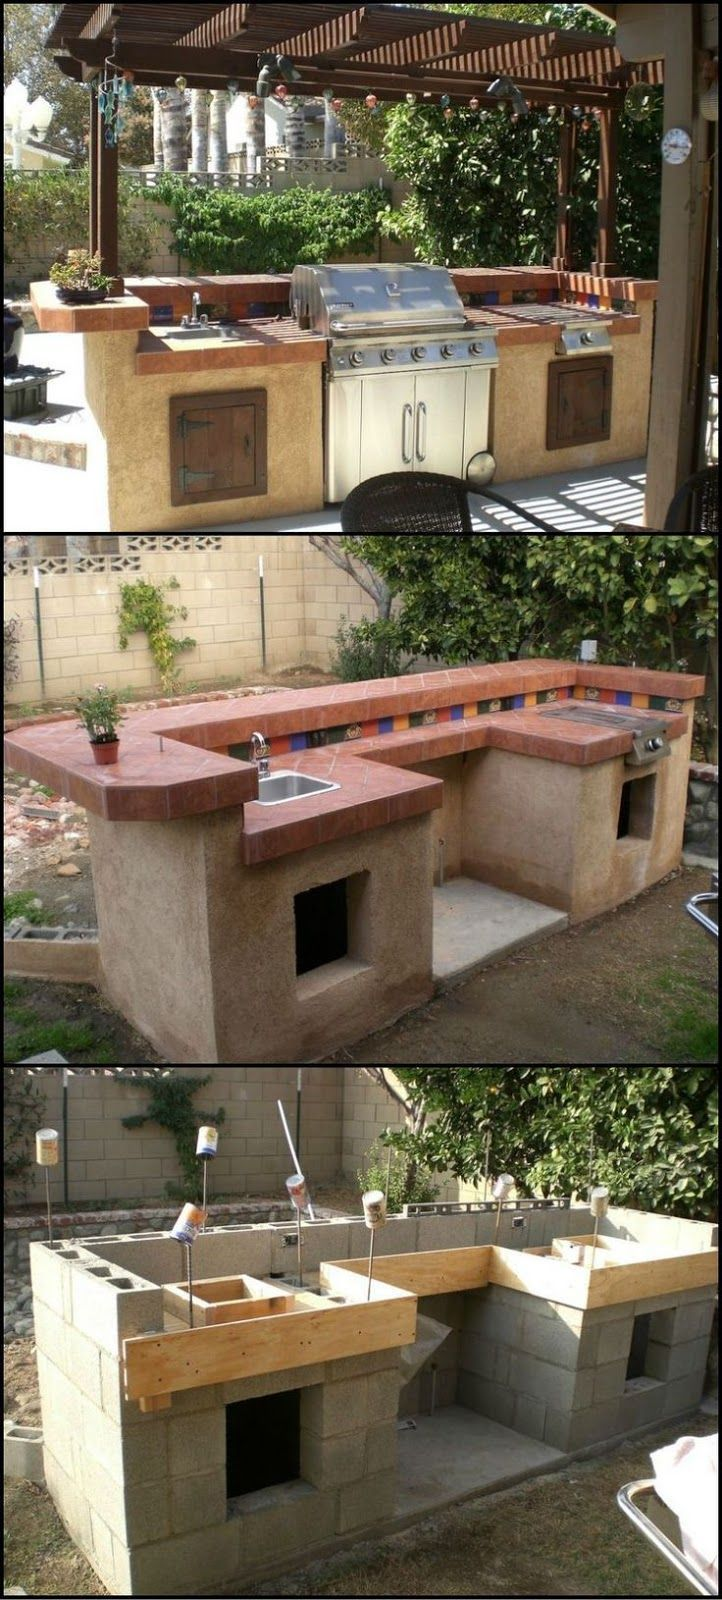 incredible outdoor kitchen ideas outdoor kitchen ideas